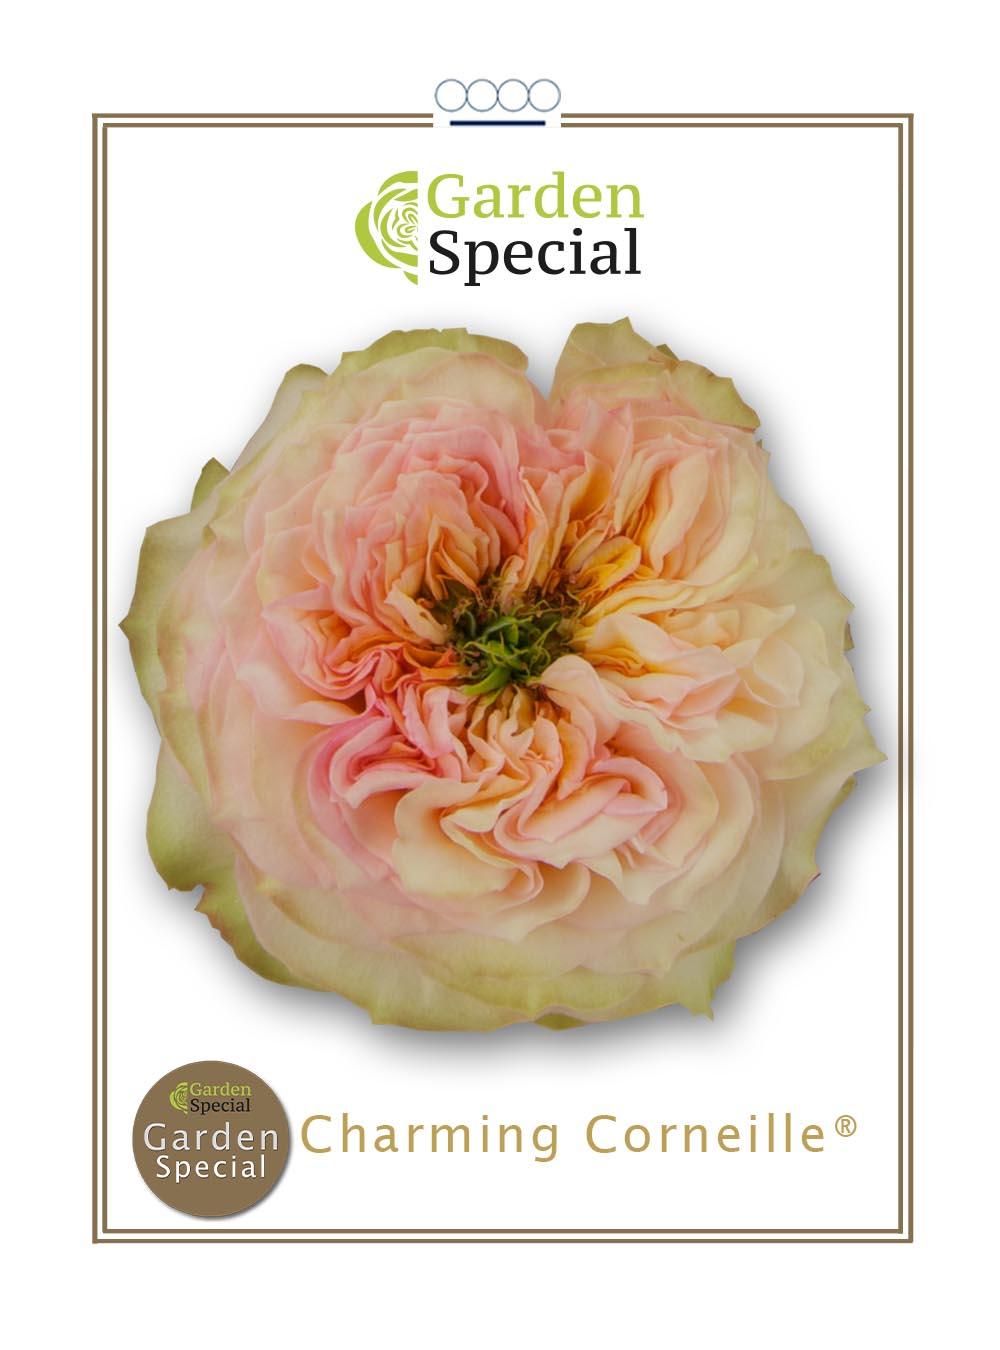 Charming Corneille®